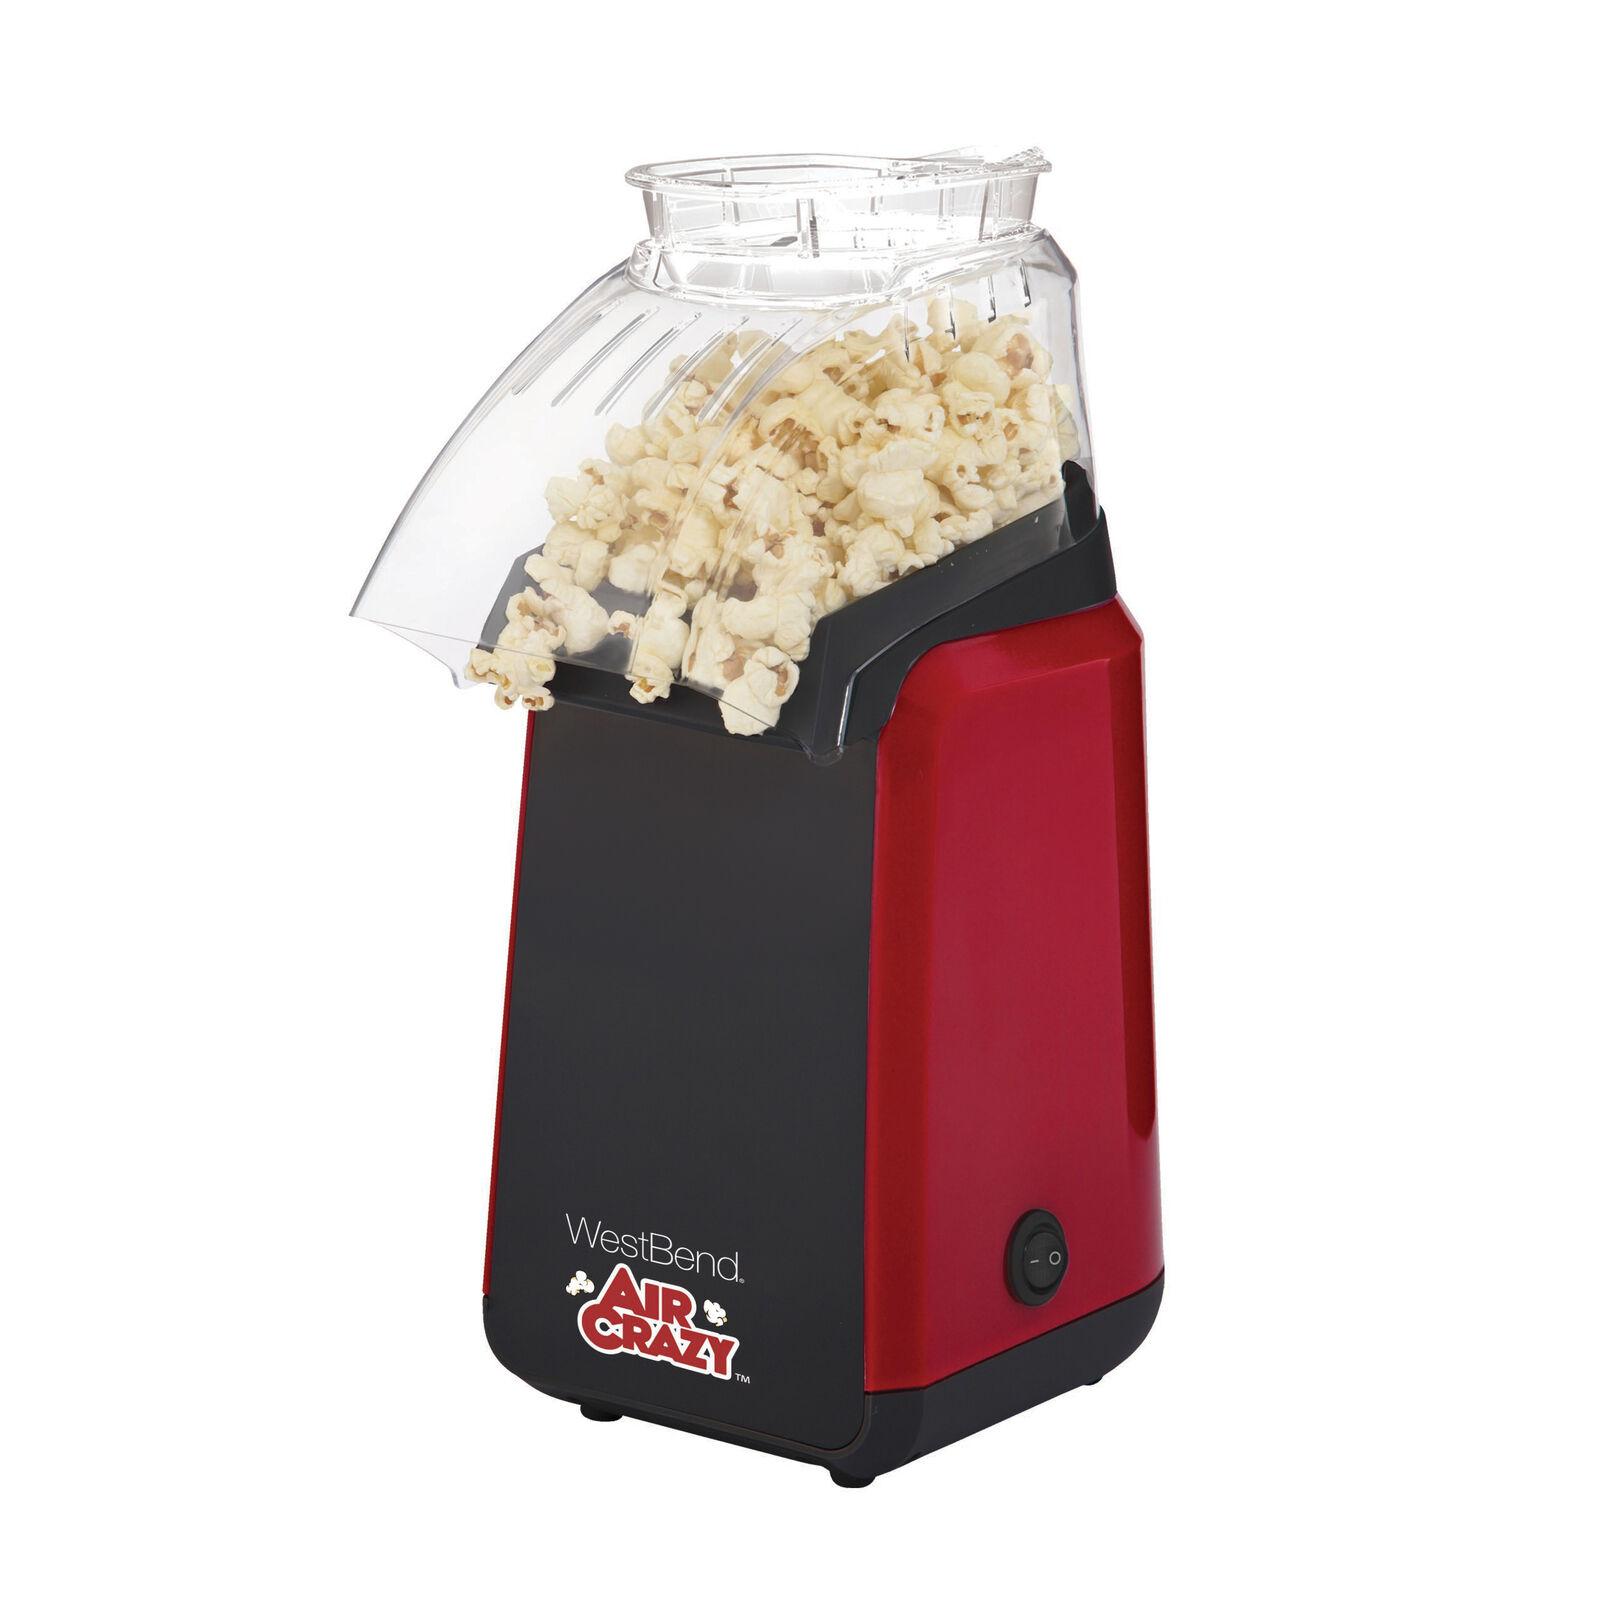 West Bend 82418BK Air Crazy Hot Air Popcorn Popper Pops Up T